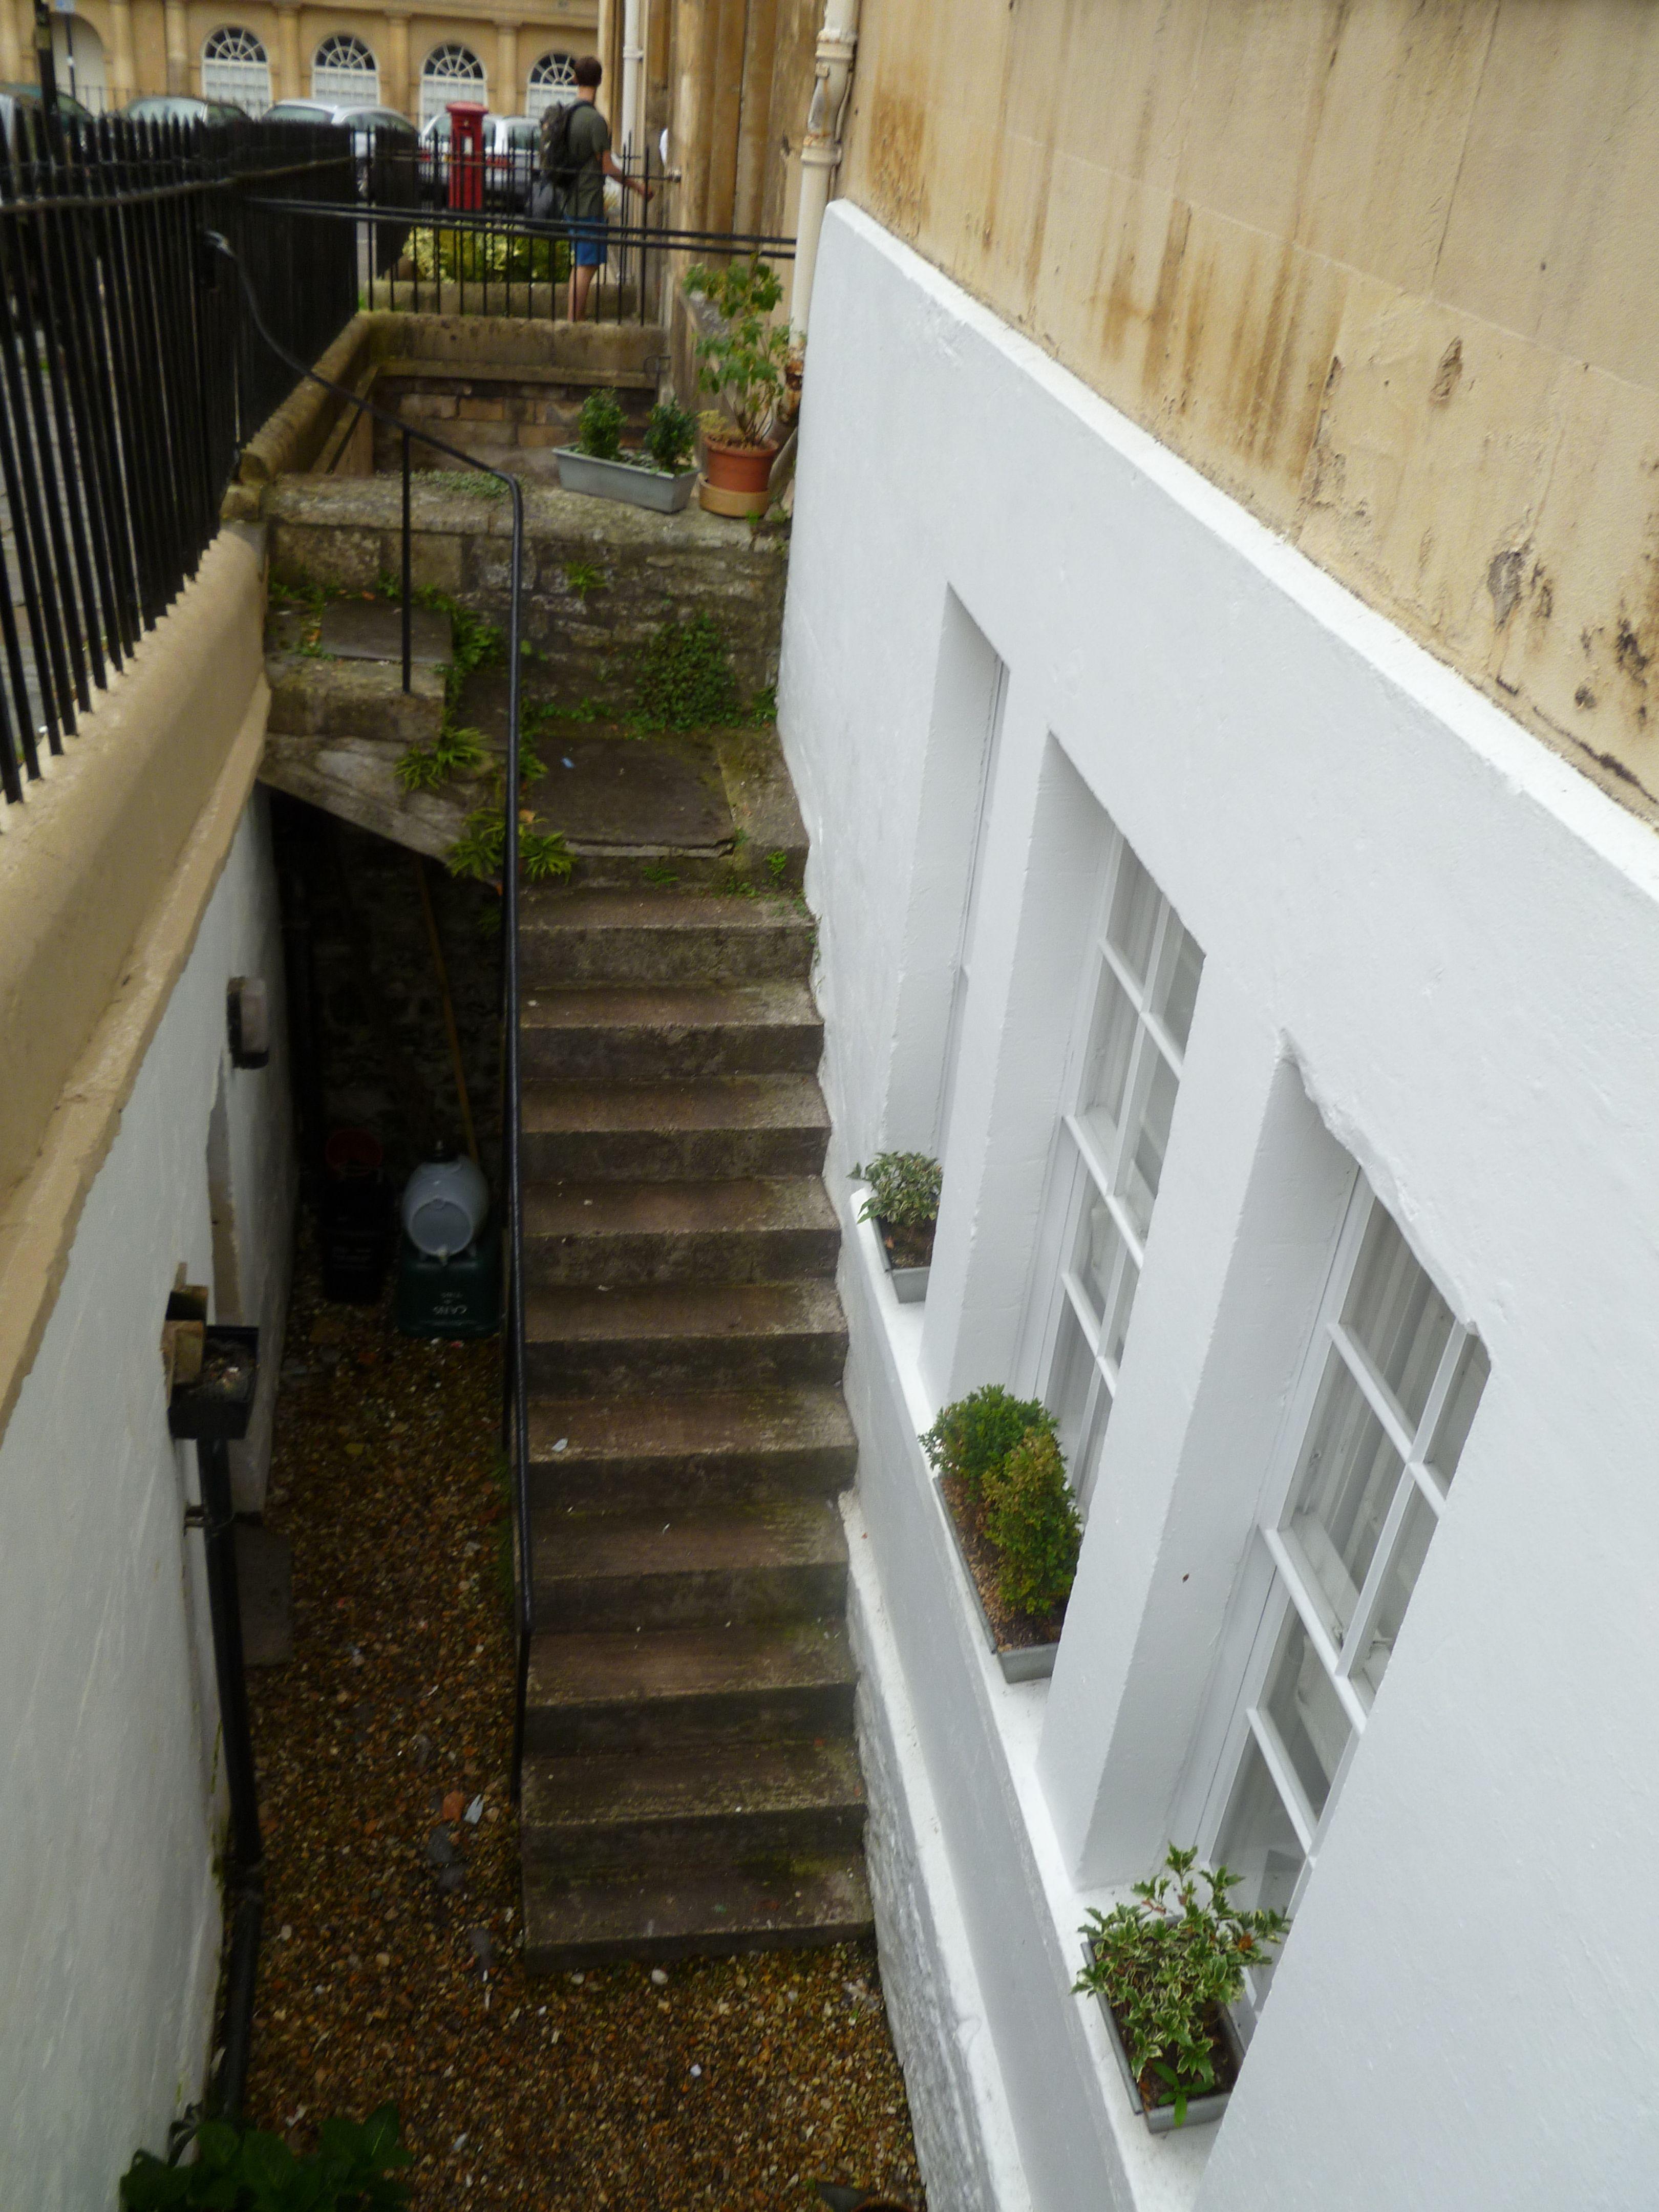 Basement steps, Bath, England | random | Pinterest